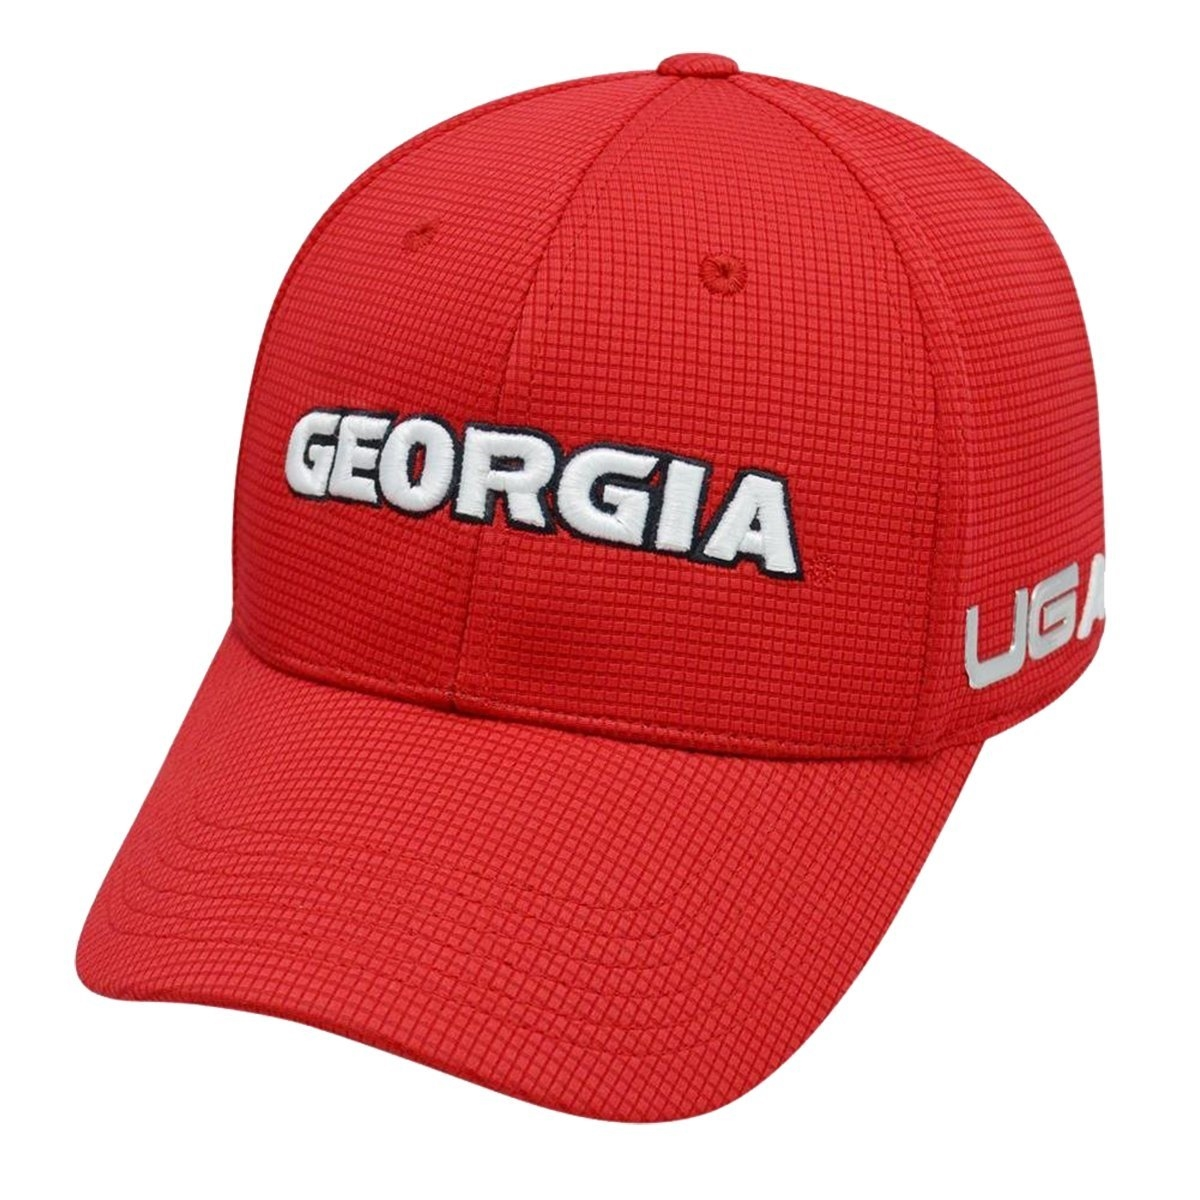 557ca5896f8 Georgia Bulldogs Sonic Weld UGA Caliber One Fit Hat